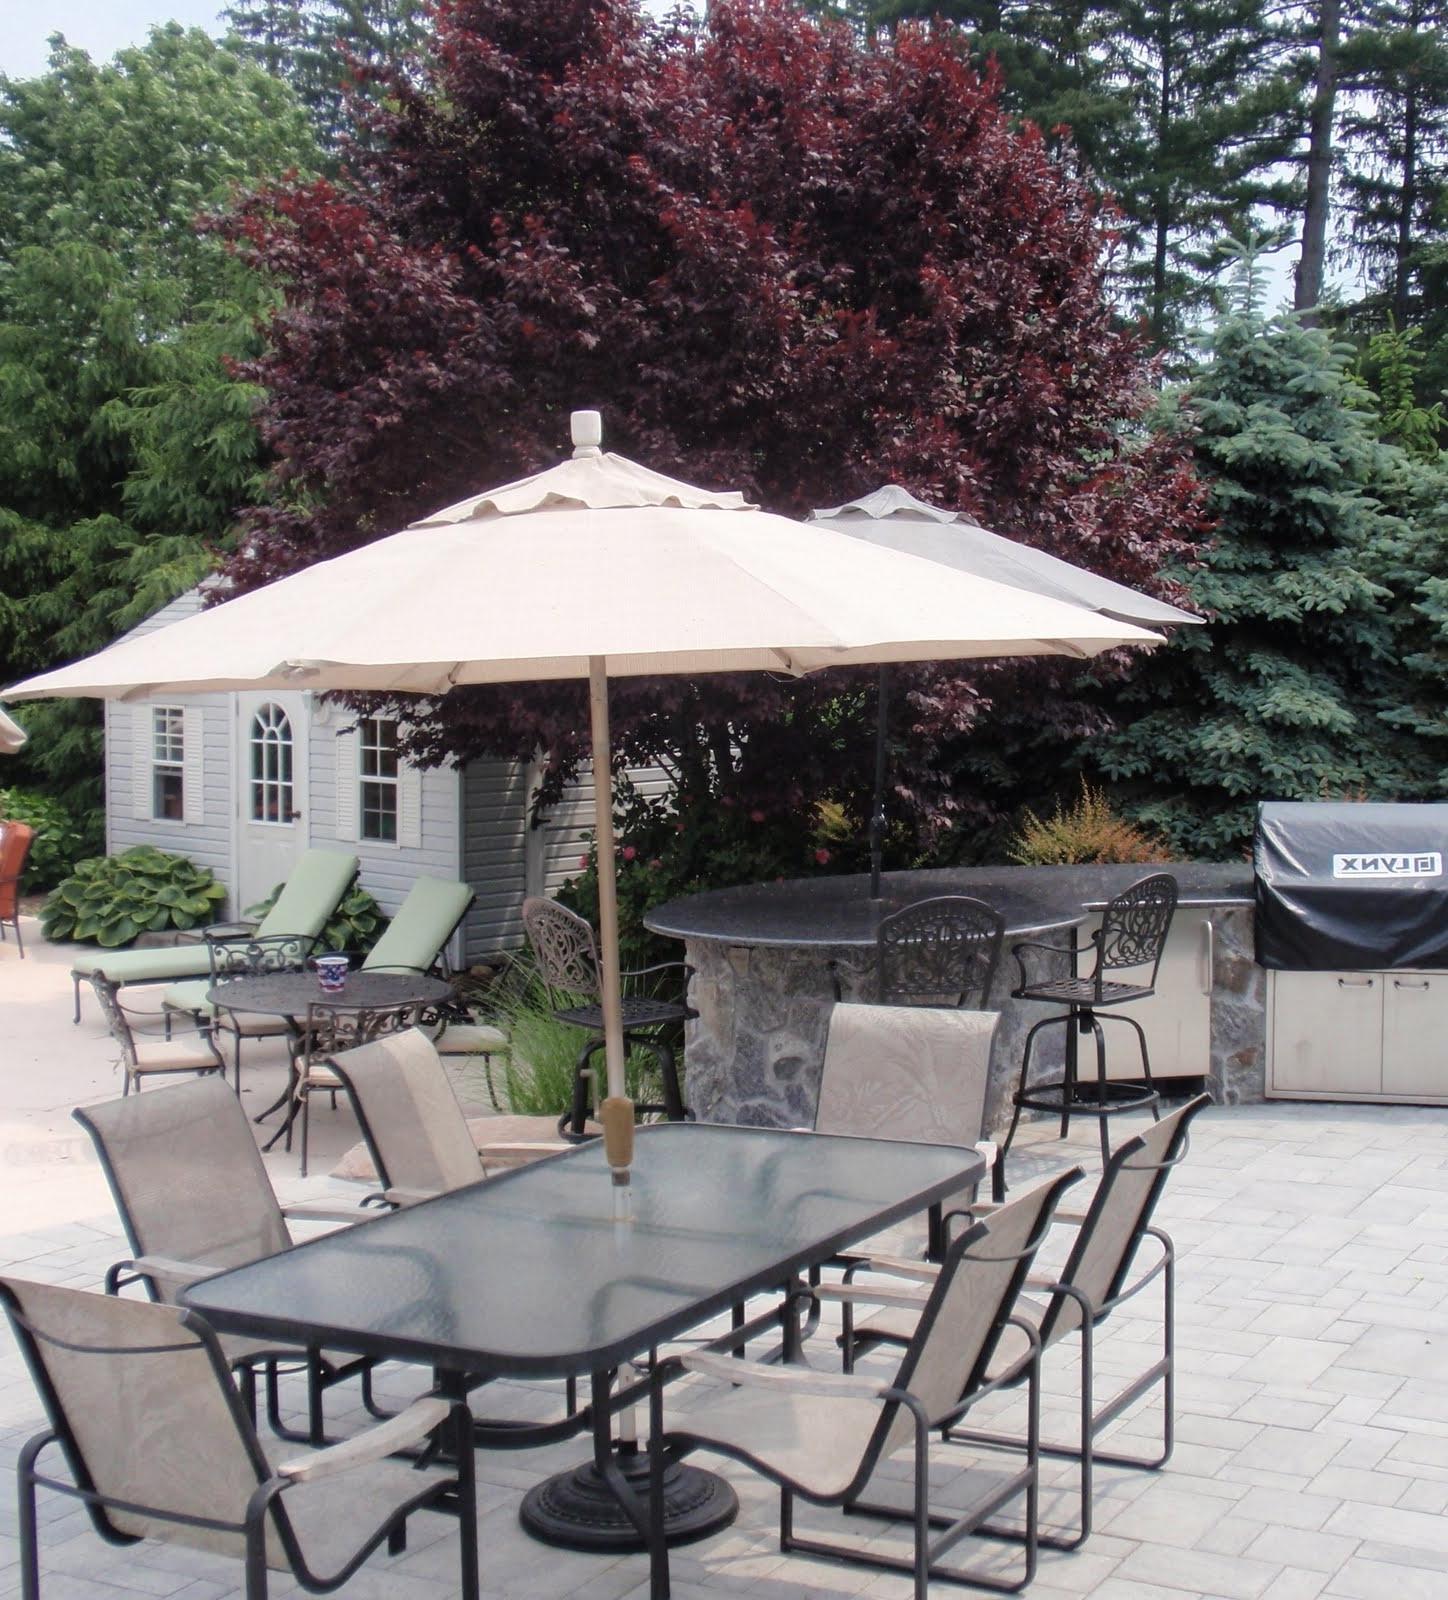 Most Current Small Patio Umbrellas Regarding Garden: Enchanting Outdoor Patio Decor Ideas With Patio Umbrellas (View 5 of 20)